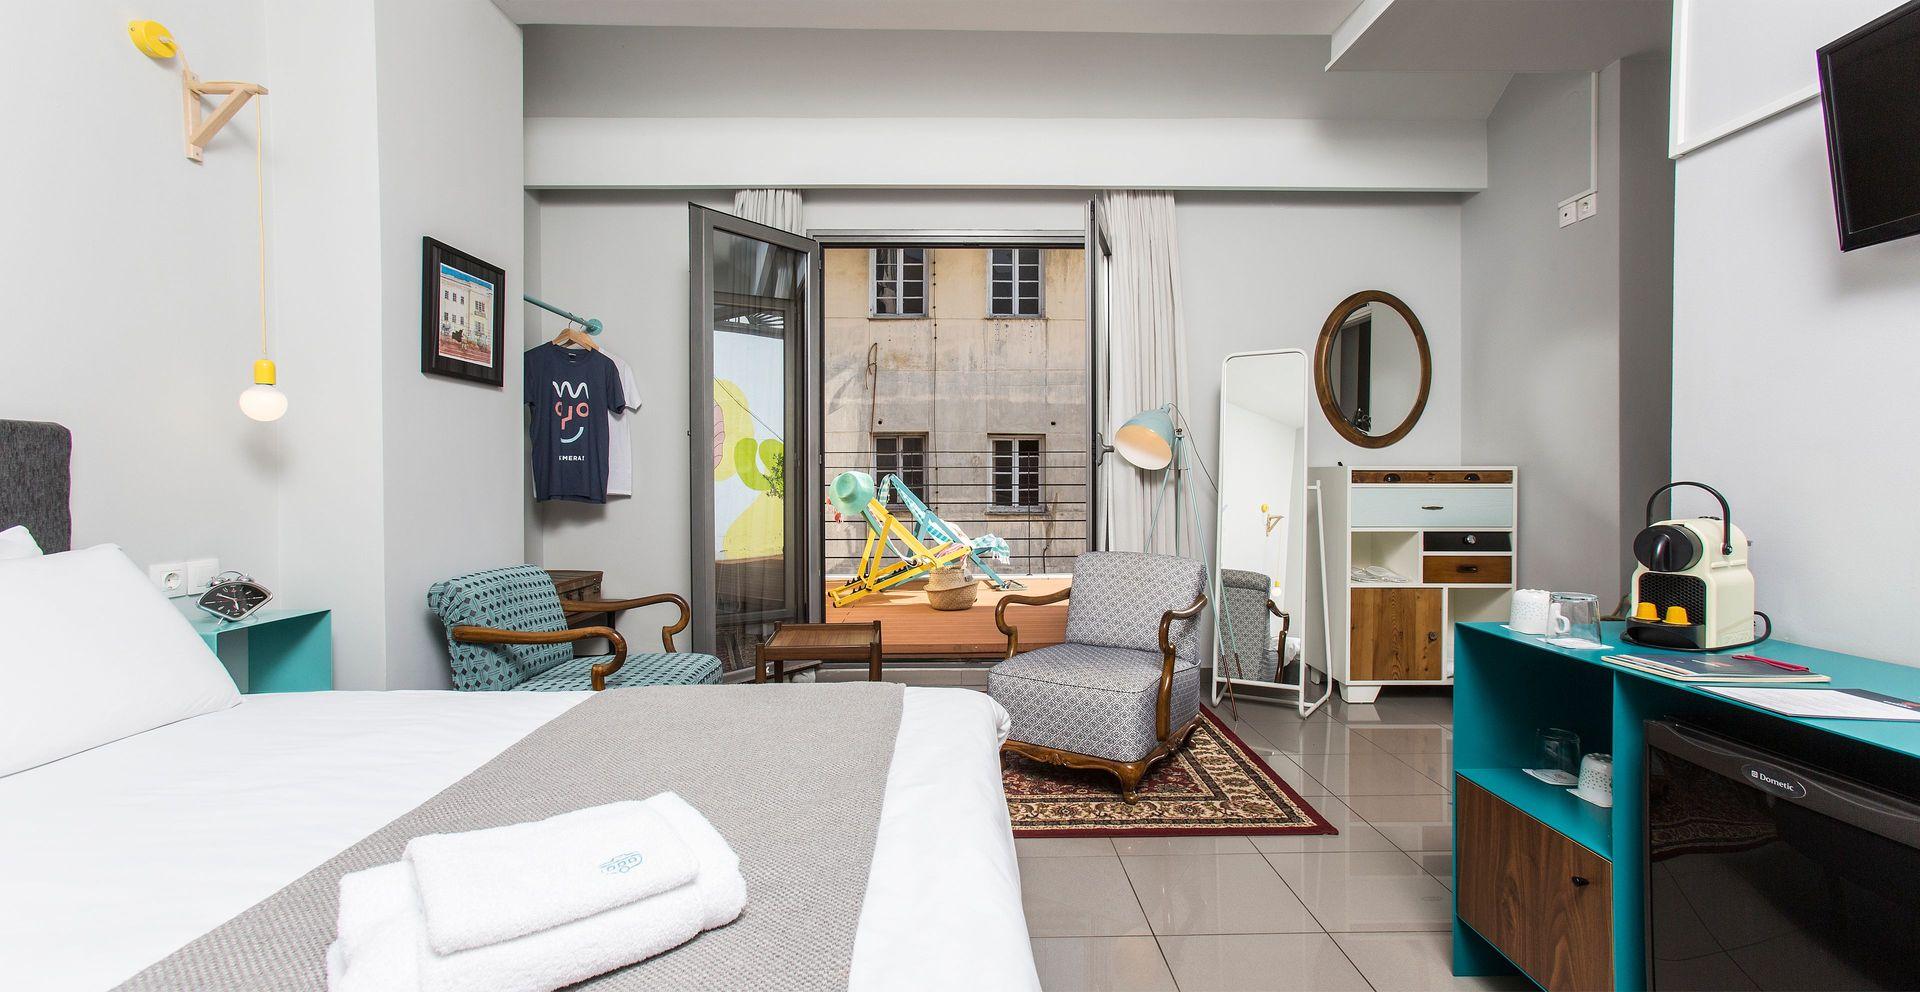 The Caravan Bed & Breakfast - Θεσσαλονίκη ✦ 2 Ημέρες